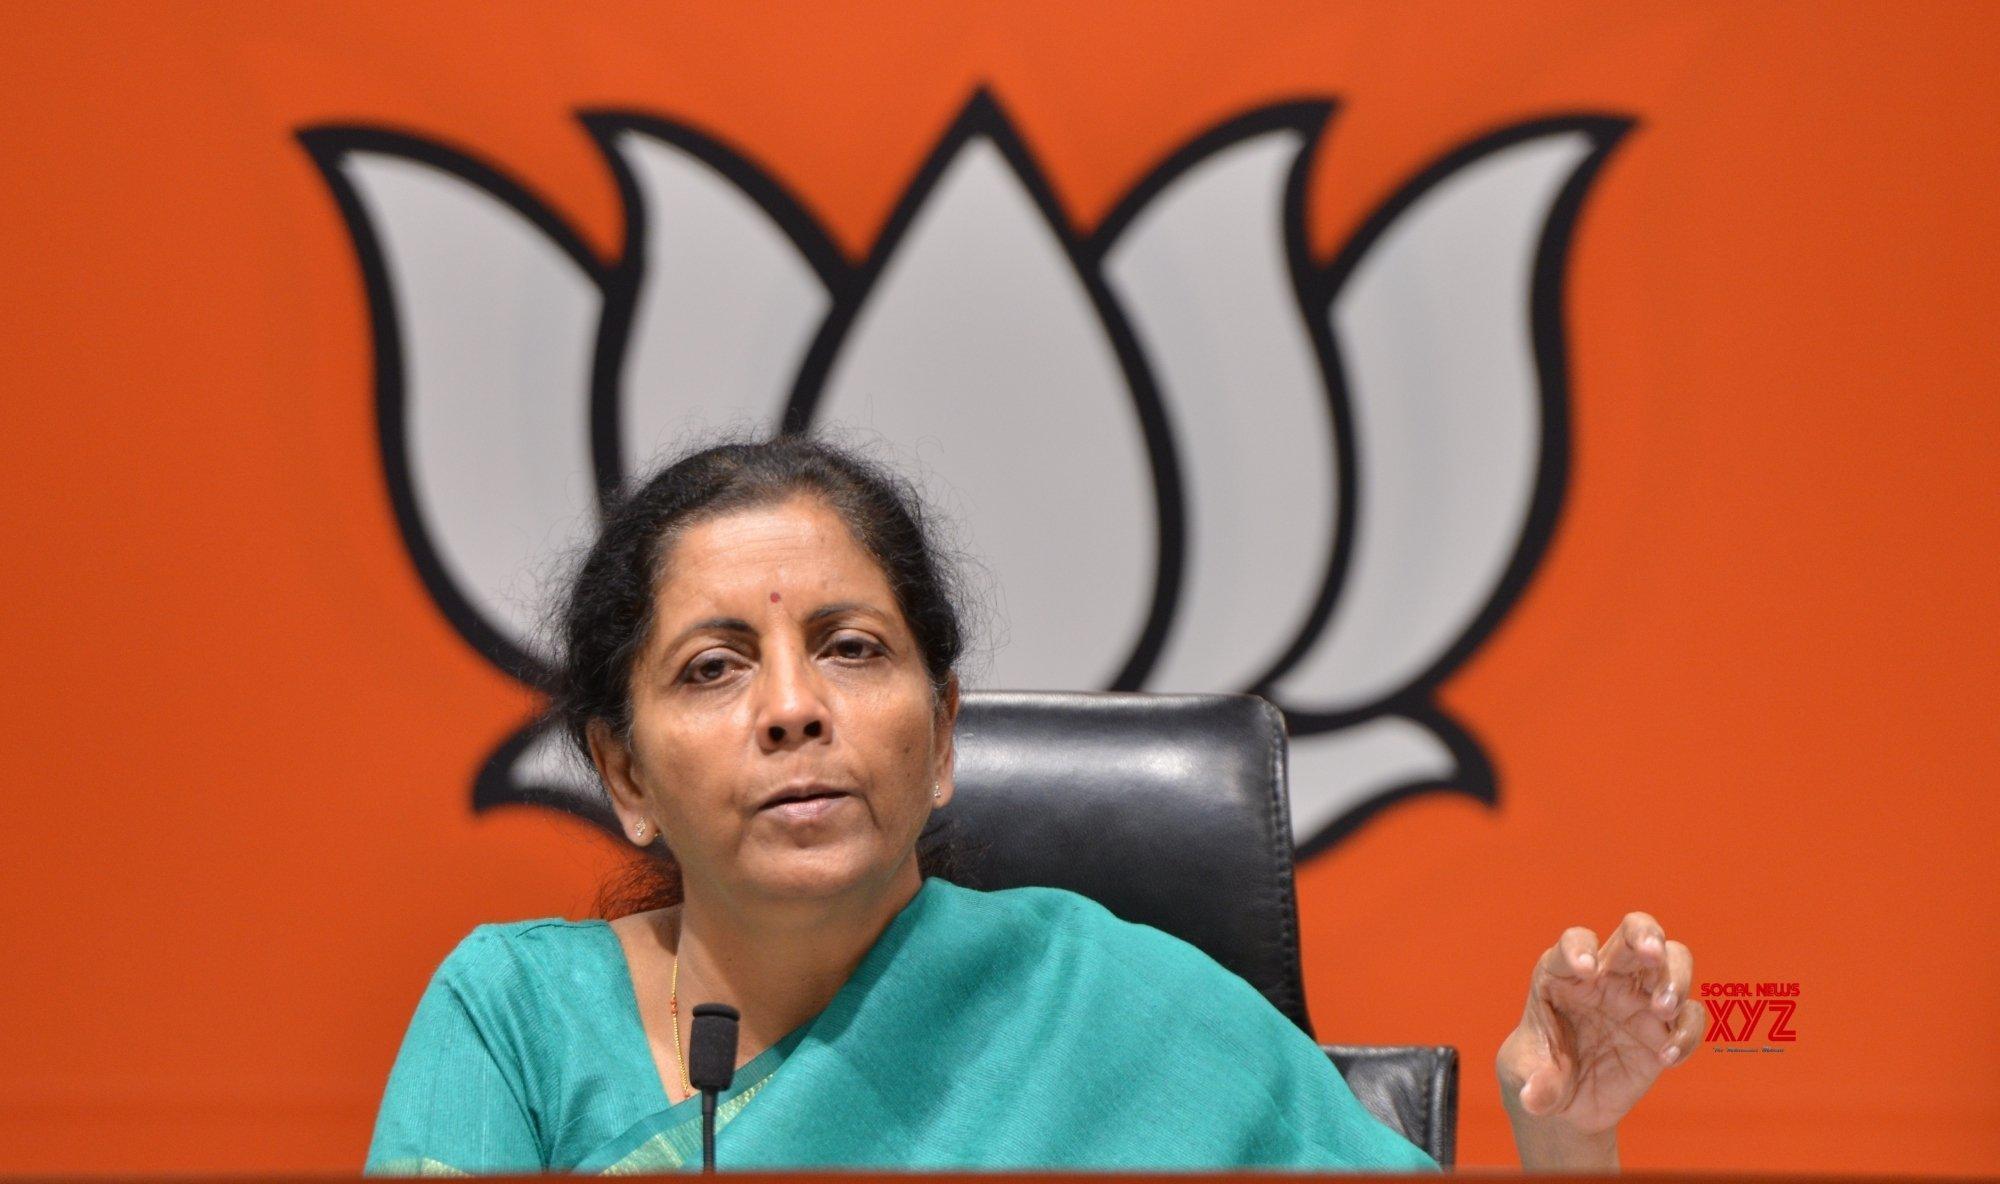 New Delhi: Nirmala Sitharaman's press conference #Gallery